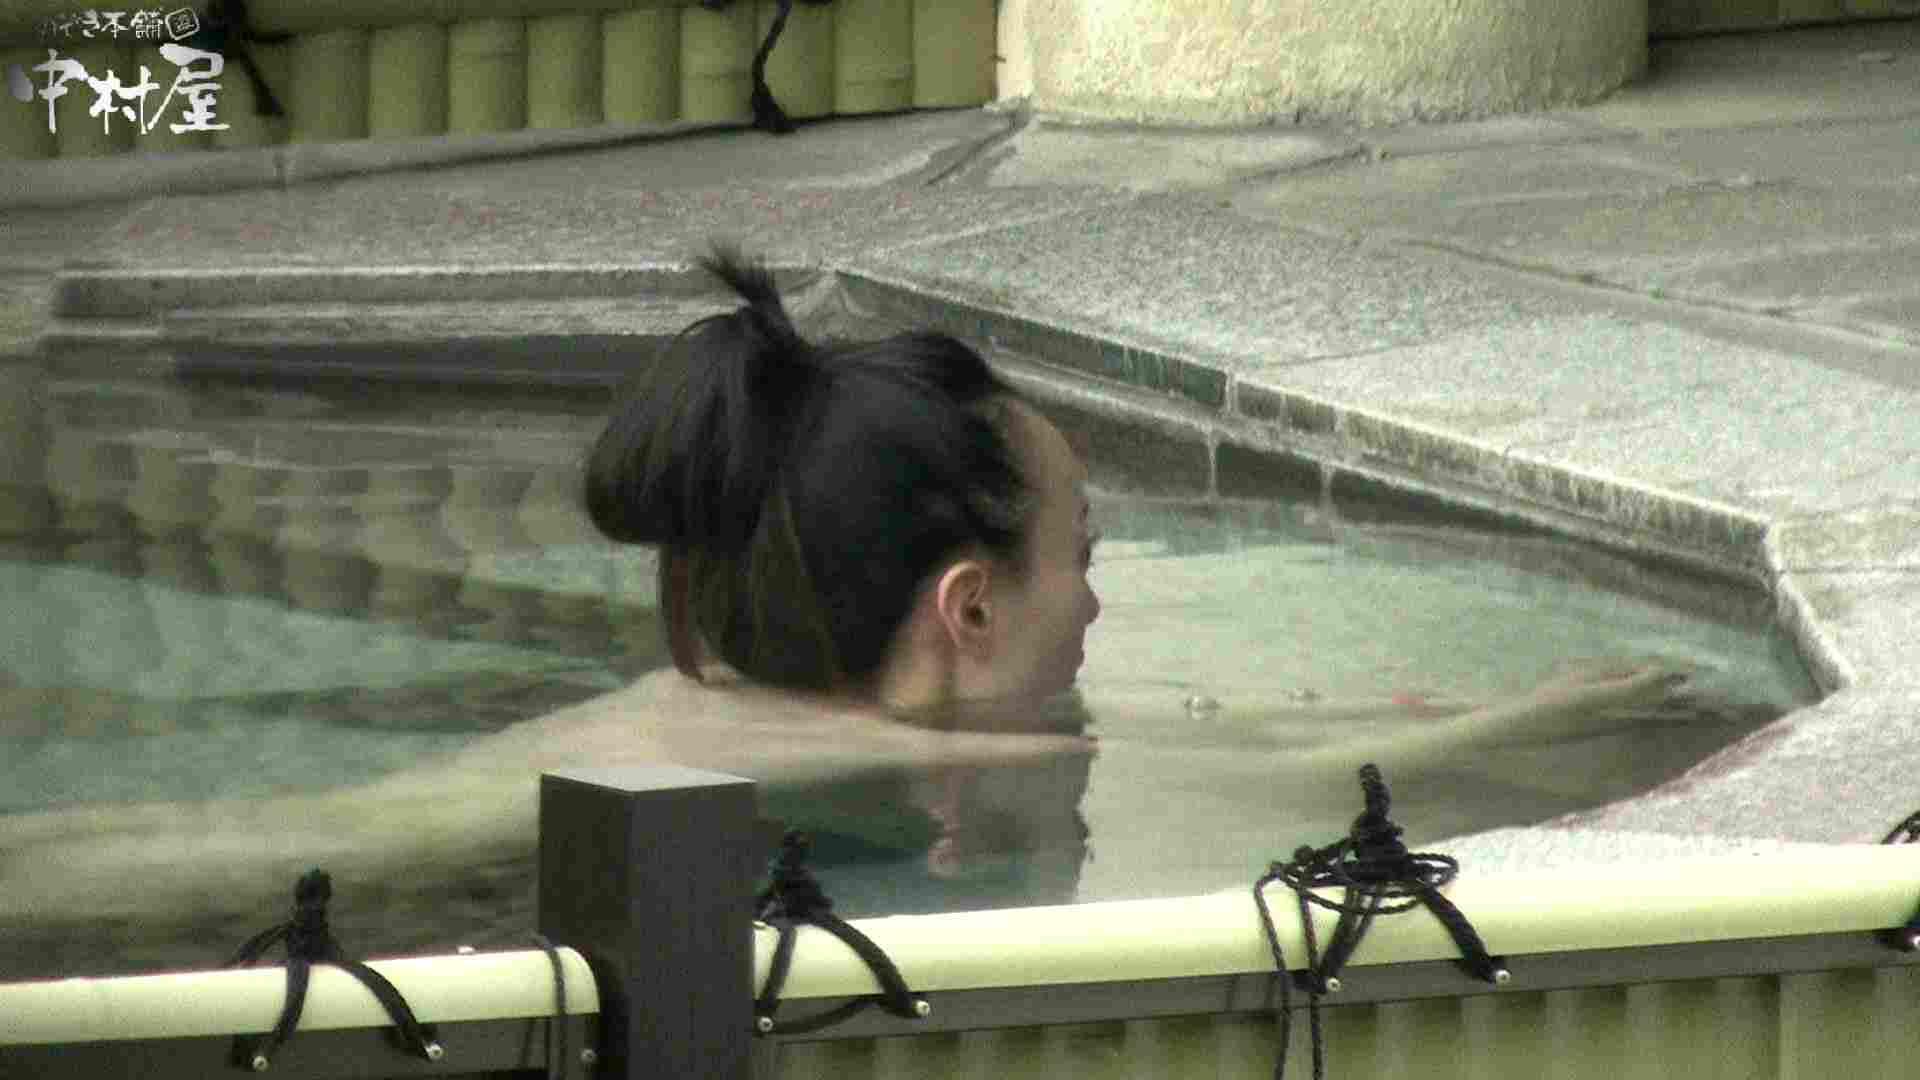 Aquaな露天風呂Vol.900 盗撮師作品 ヌード画像 86pic 44